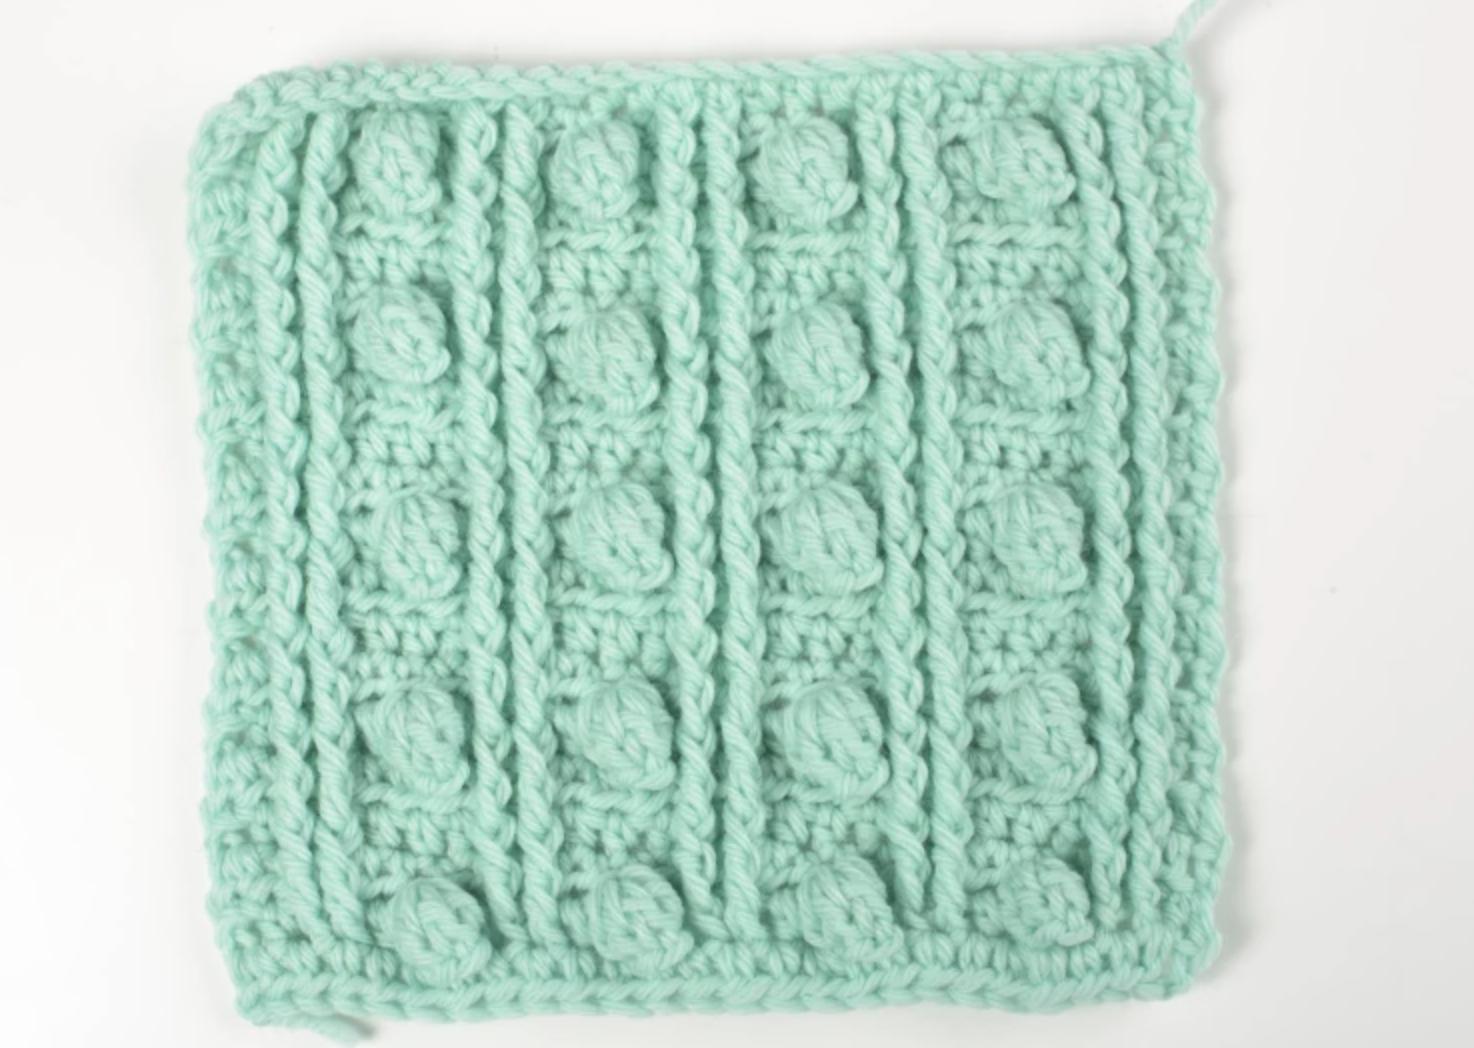 popcorn crochet stitch